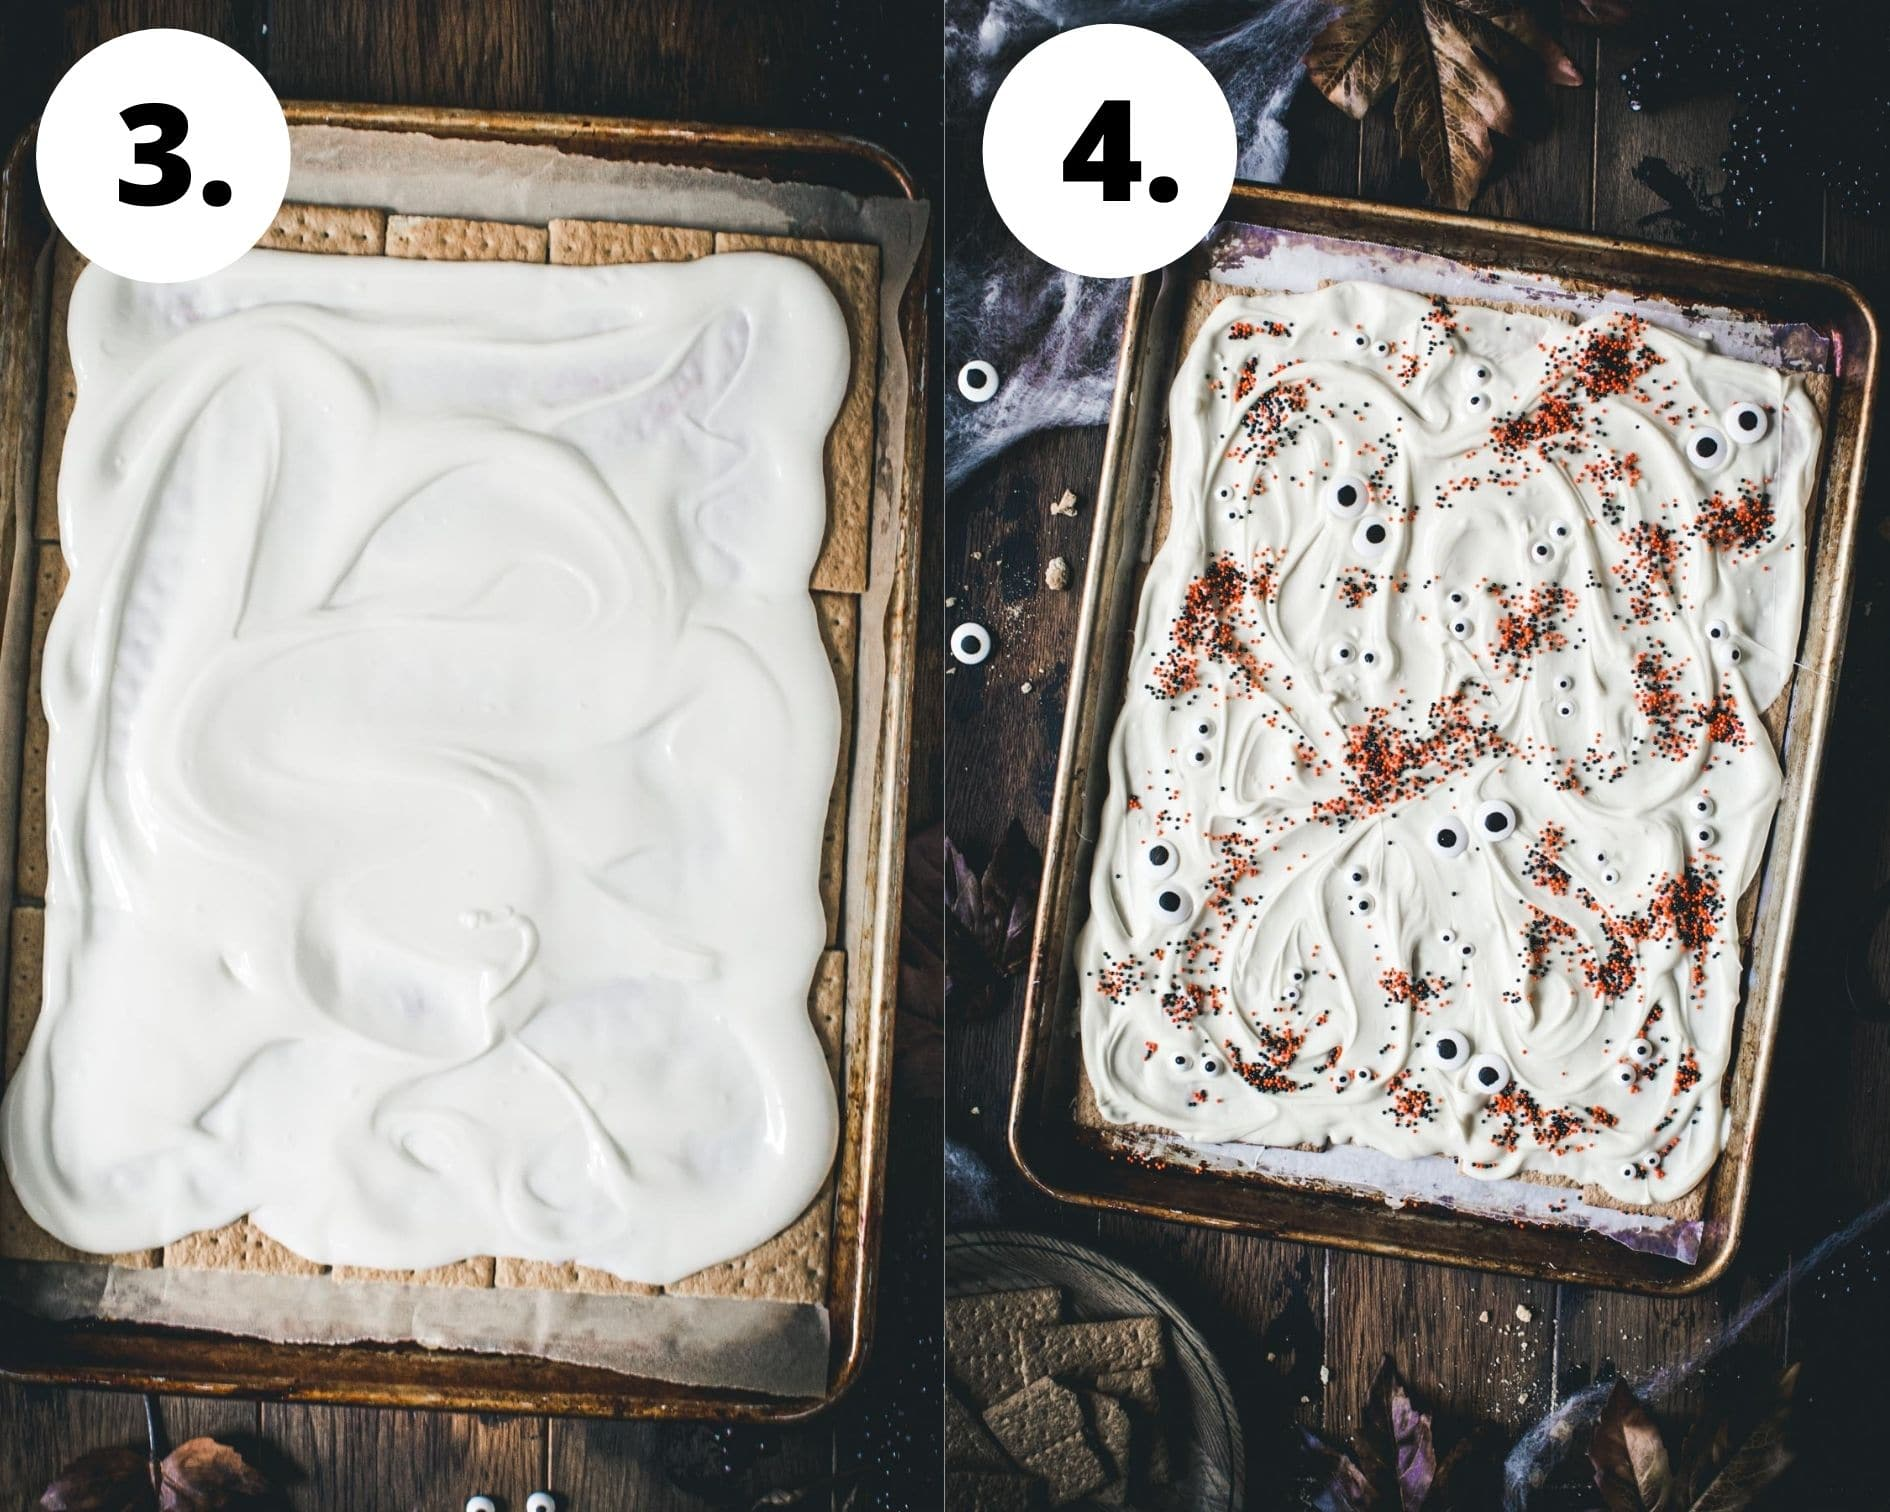 Almond bark process steps 3 and 4.